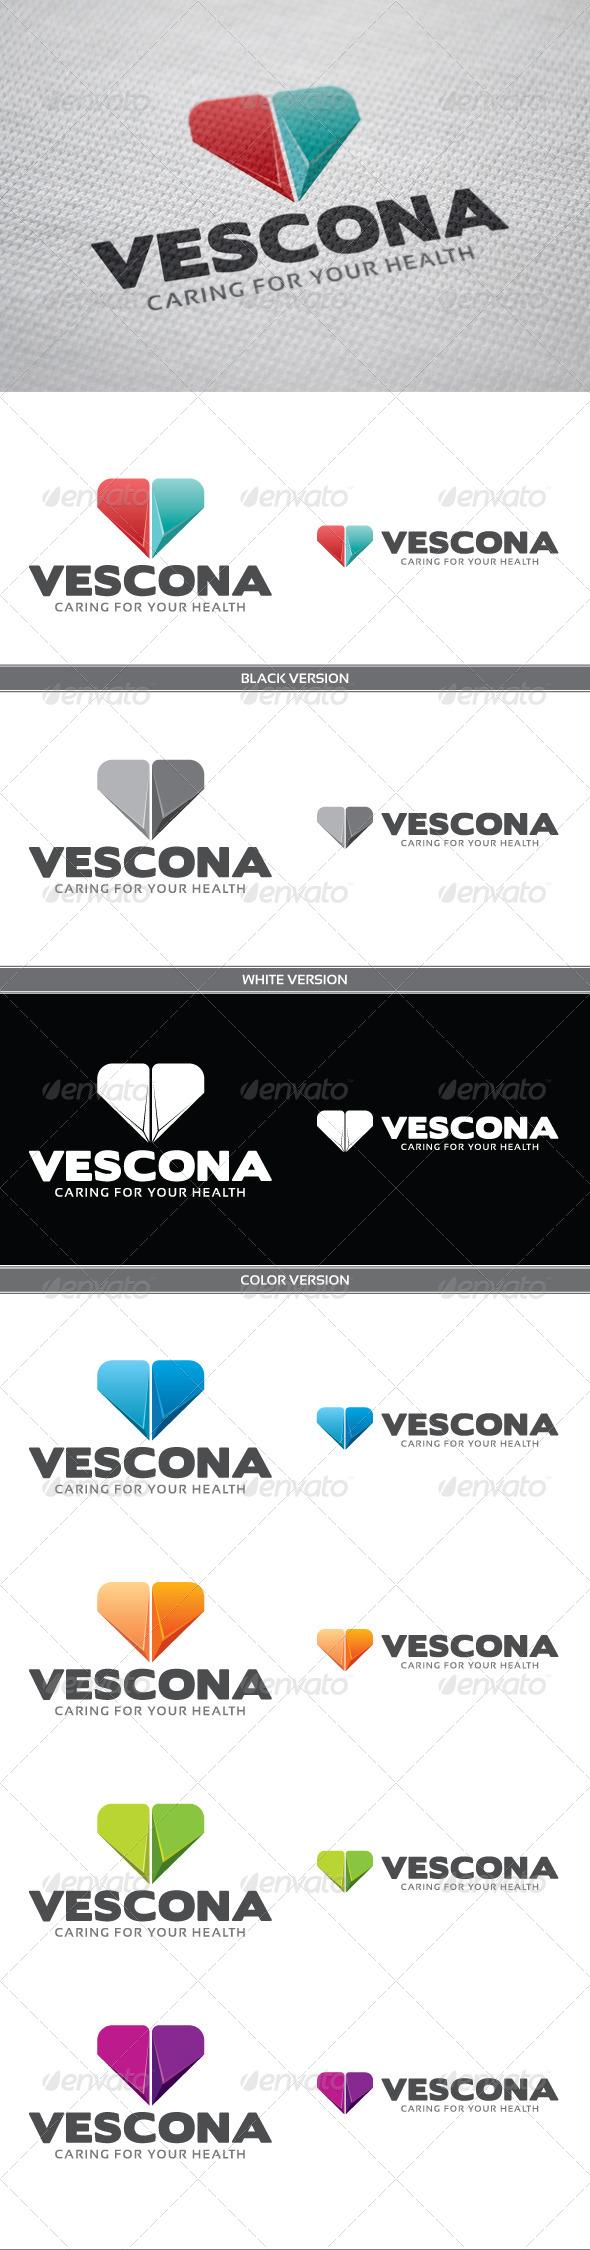 Vescona - Letters Logo Templates